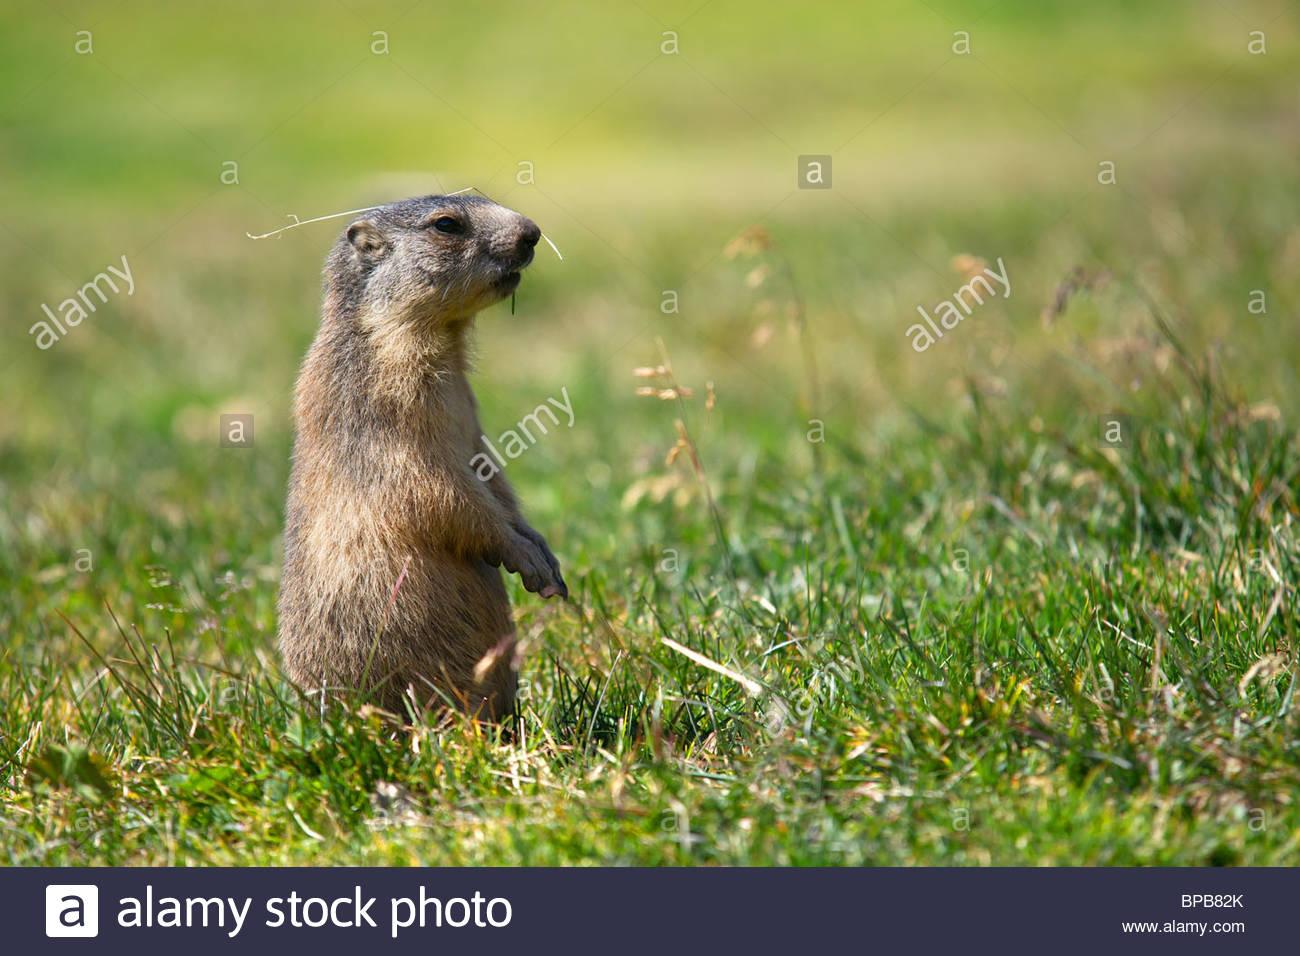 alpine marmot (marmota marmota) standing with a blade of grass over its head - Stock Image